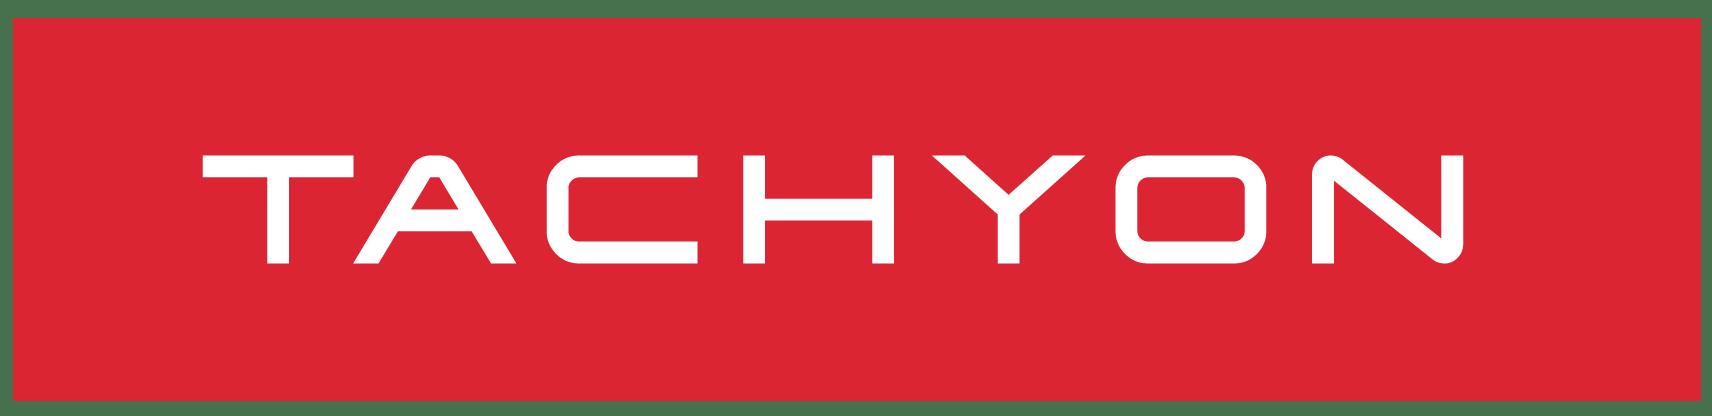 Tachyon logistics